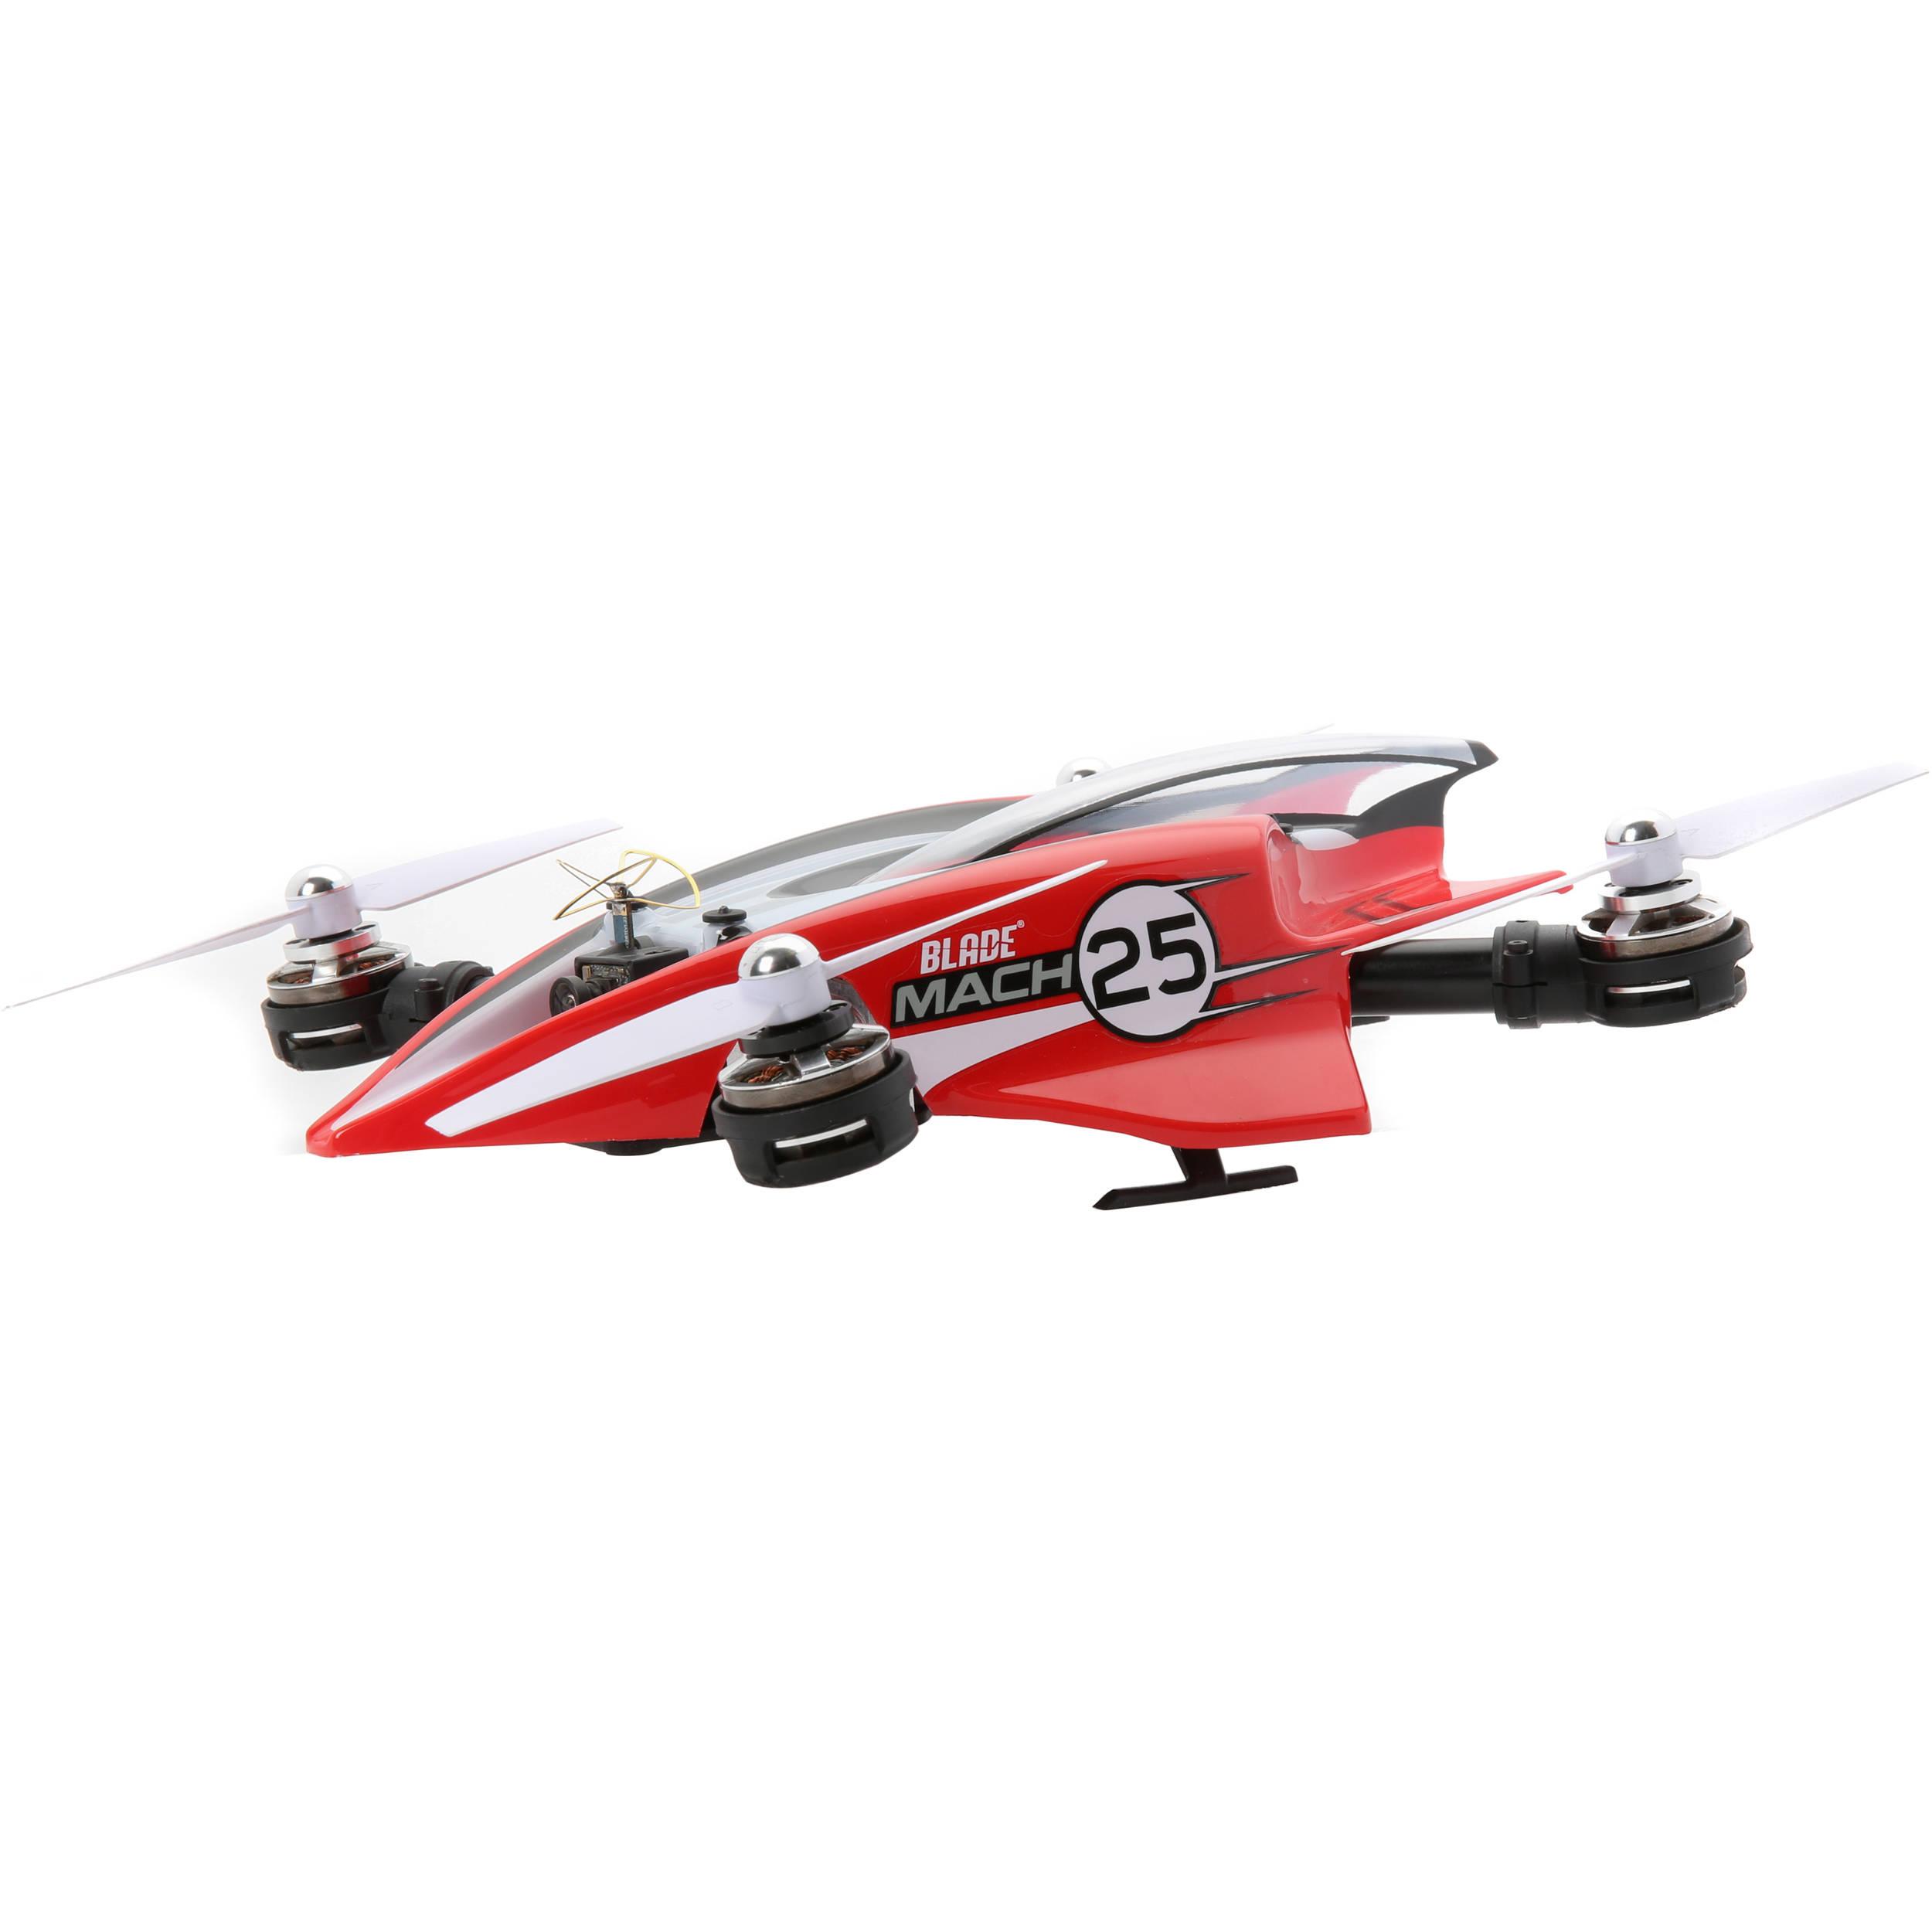 BLADE Mach 25 FPV Racer (BNF) ...